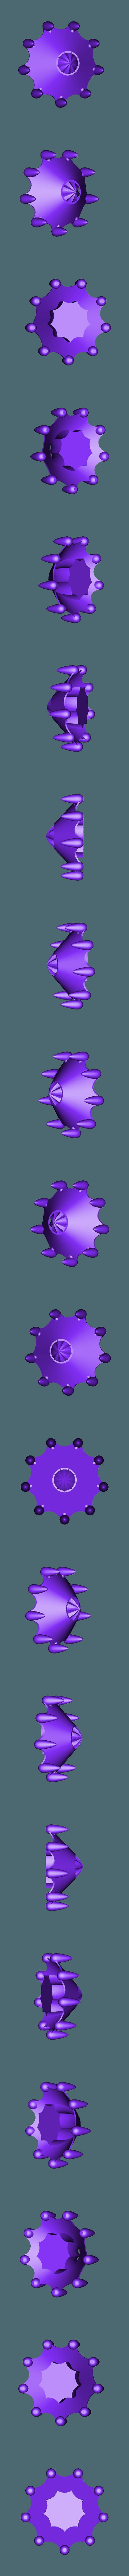 citrus_lower.stl Download free STL file citrus juicer press - lemon juicer press - orange juicer • Object to 3D print, kakiemon